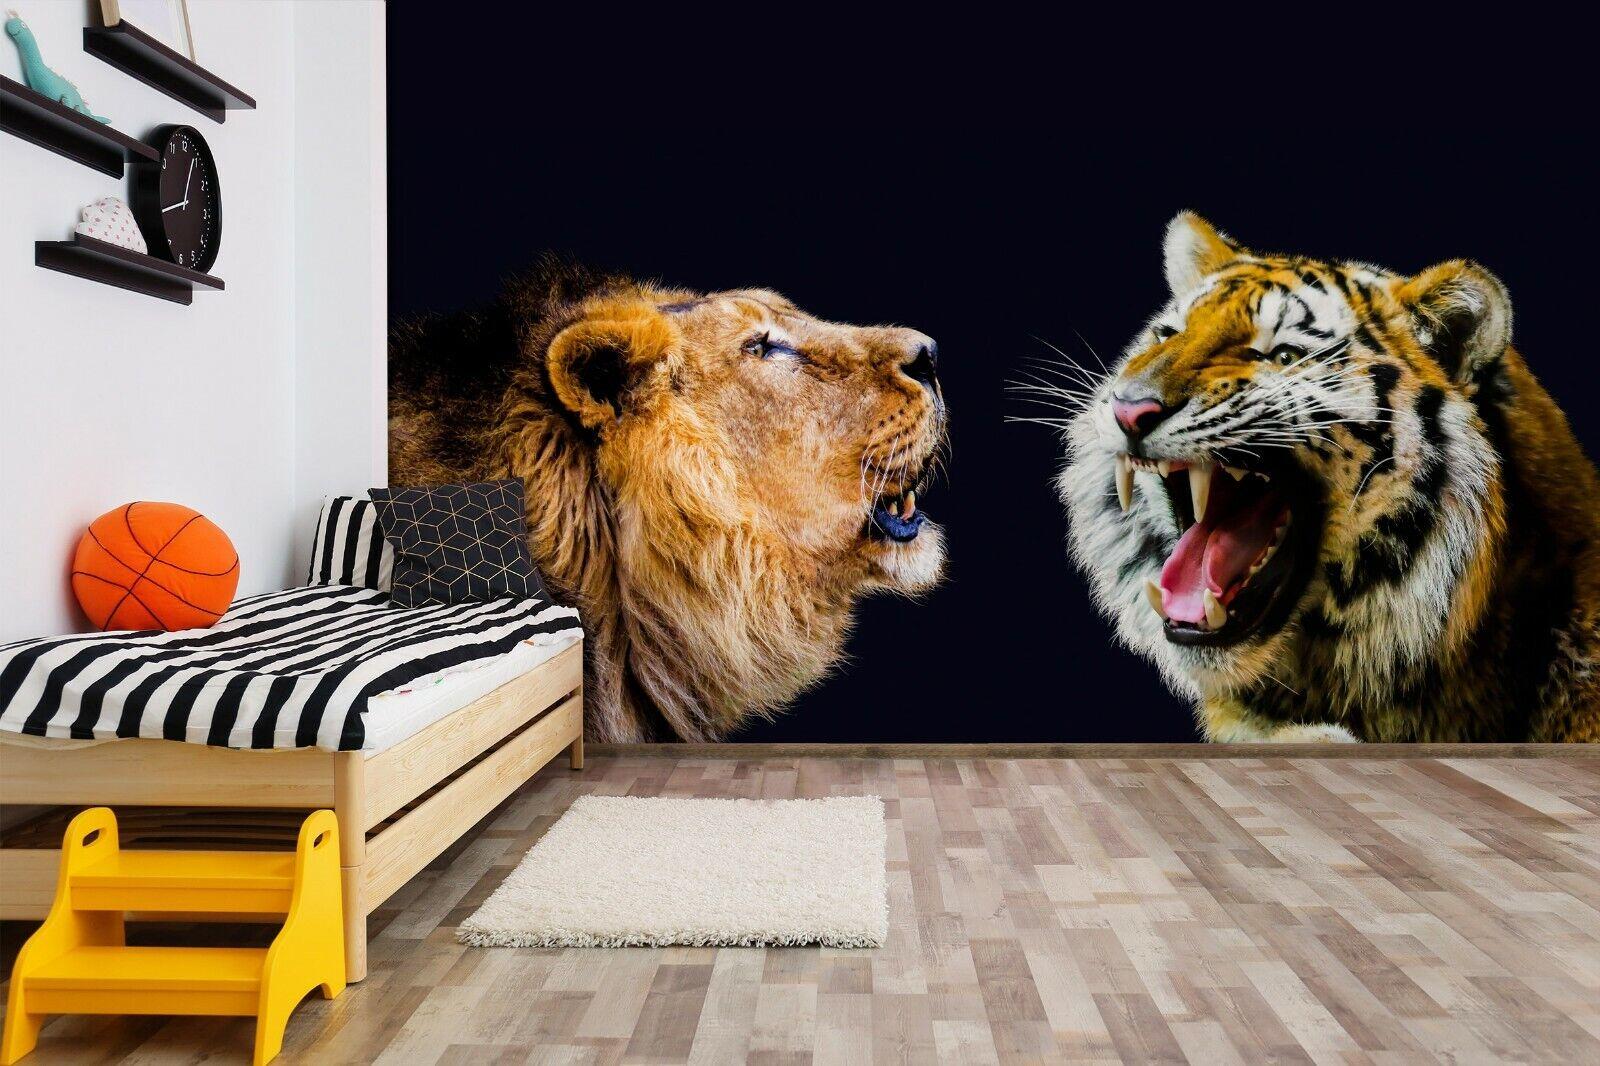 3D Wut Tiger M108 Tier Tapete Wandbild Selbstklebend Abnehmbare Angelia